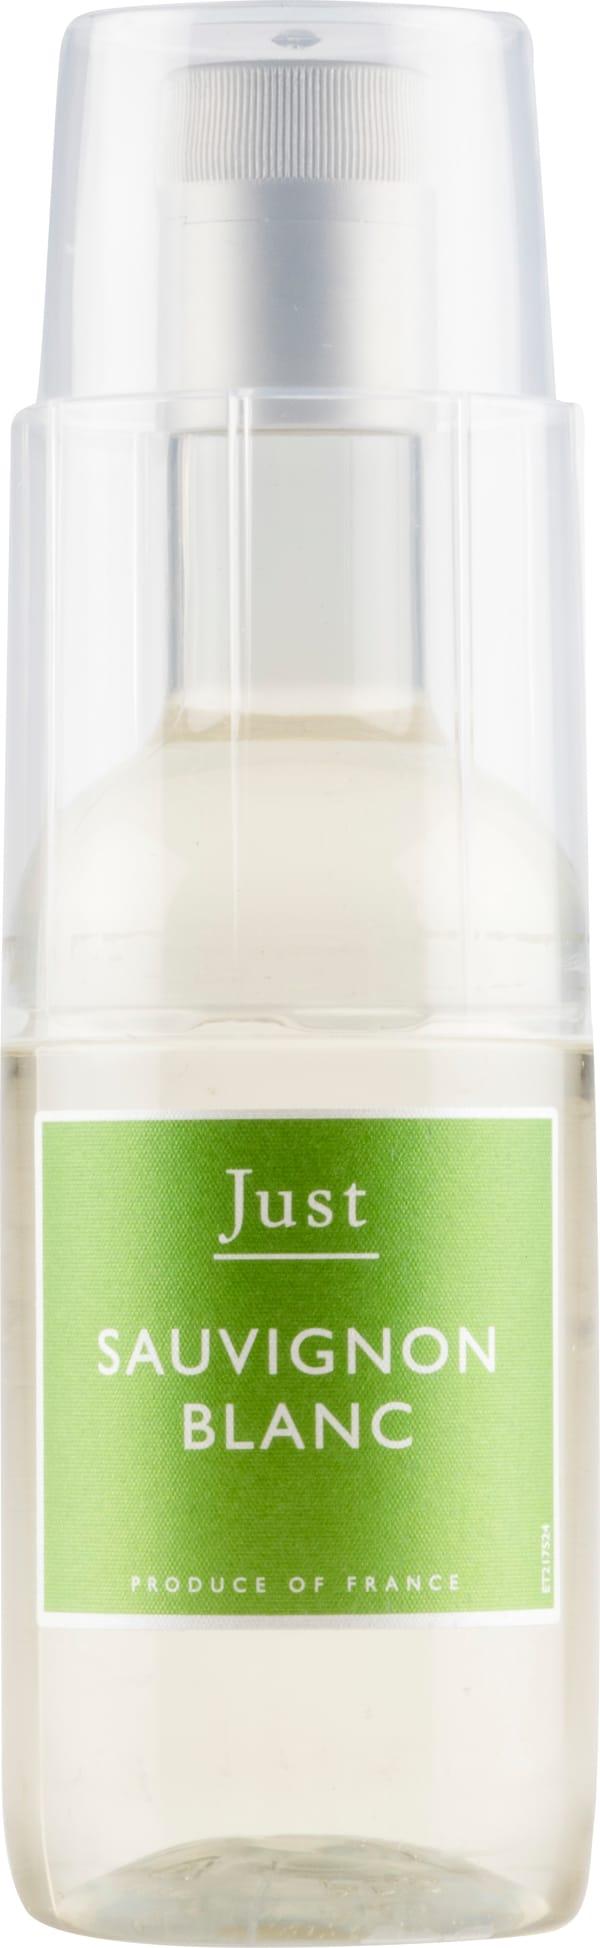 Just Sauvignon Blanc plastic bottle